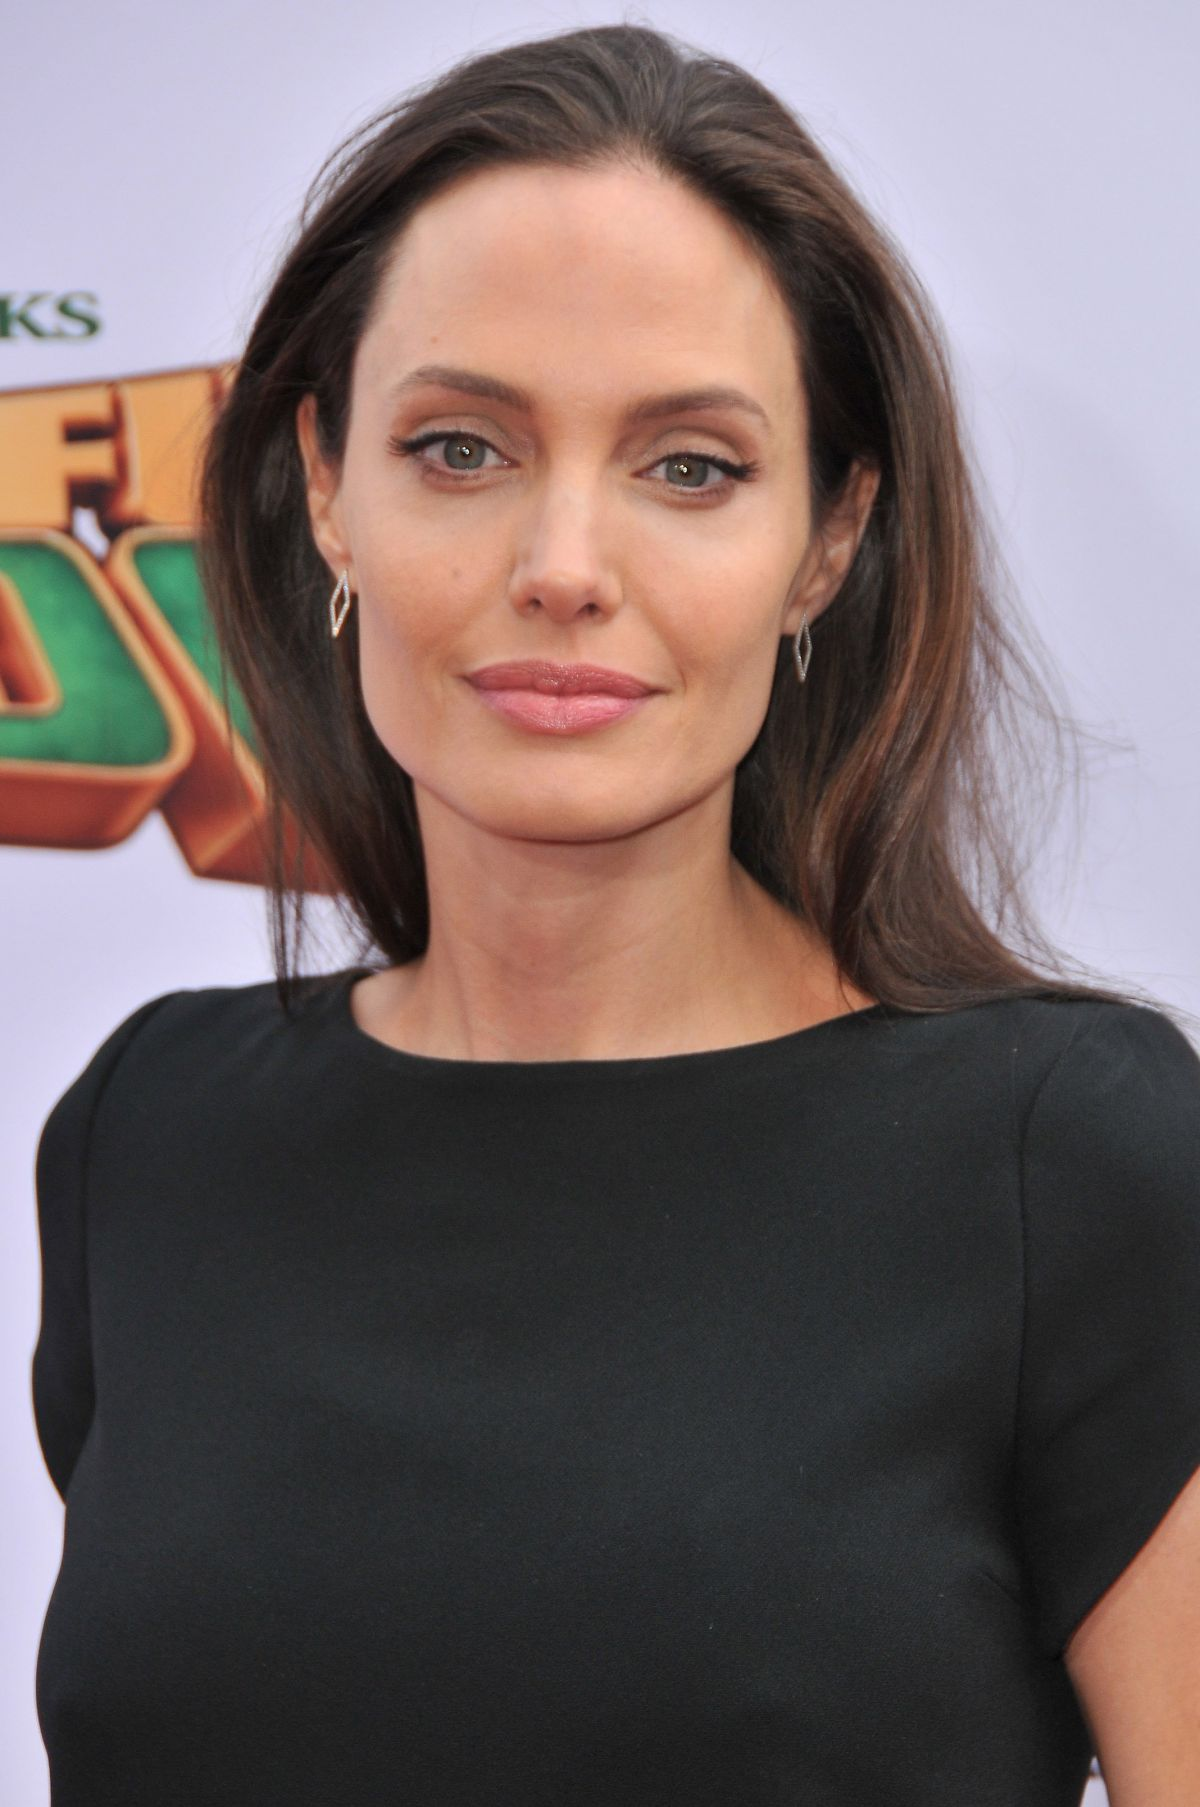 ANGELINA JOLIE at Kung... Angelina Jolie